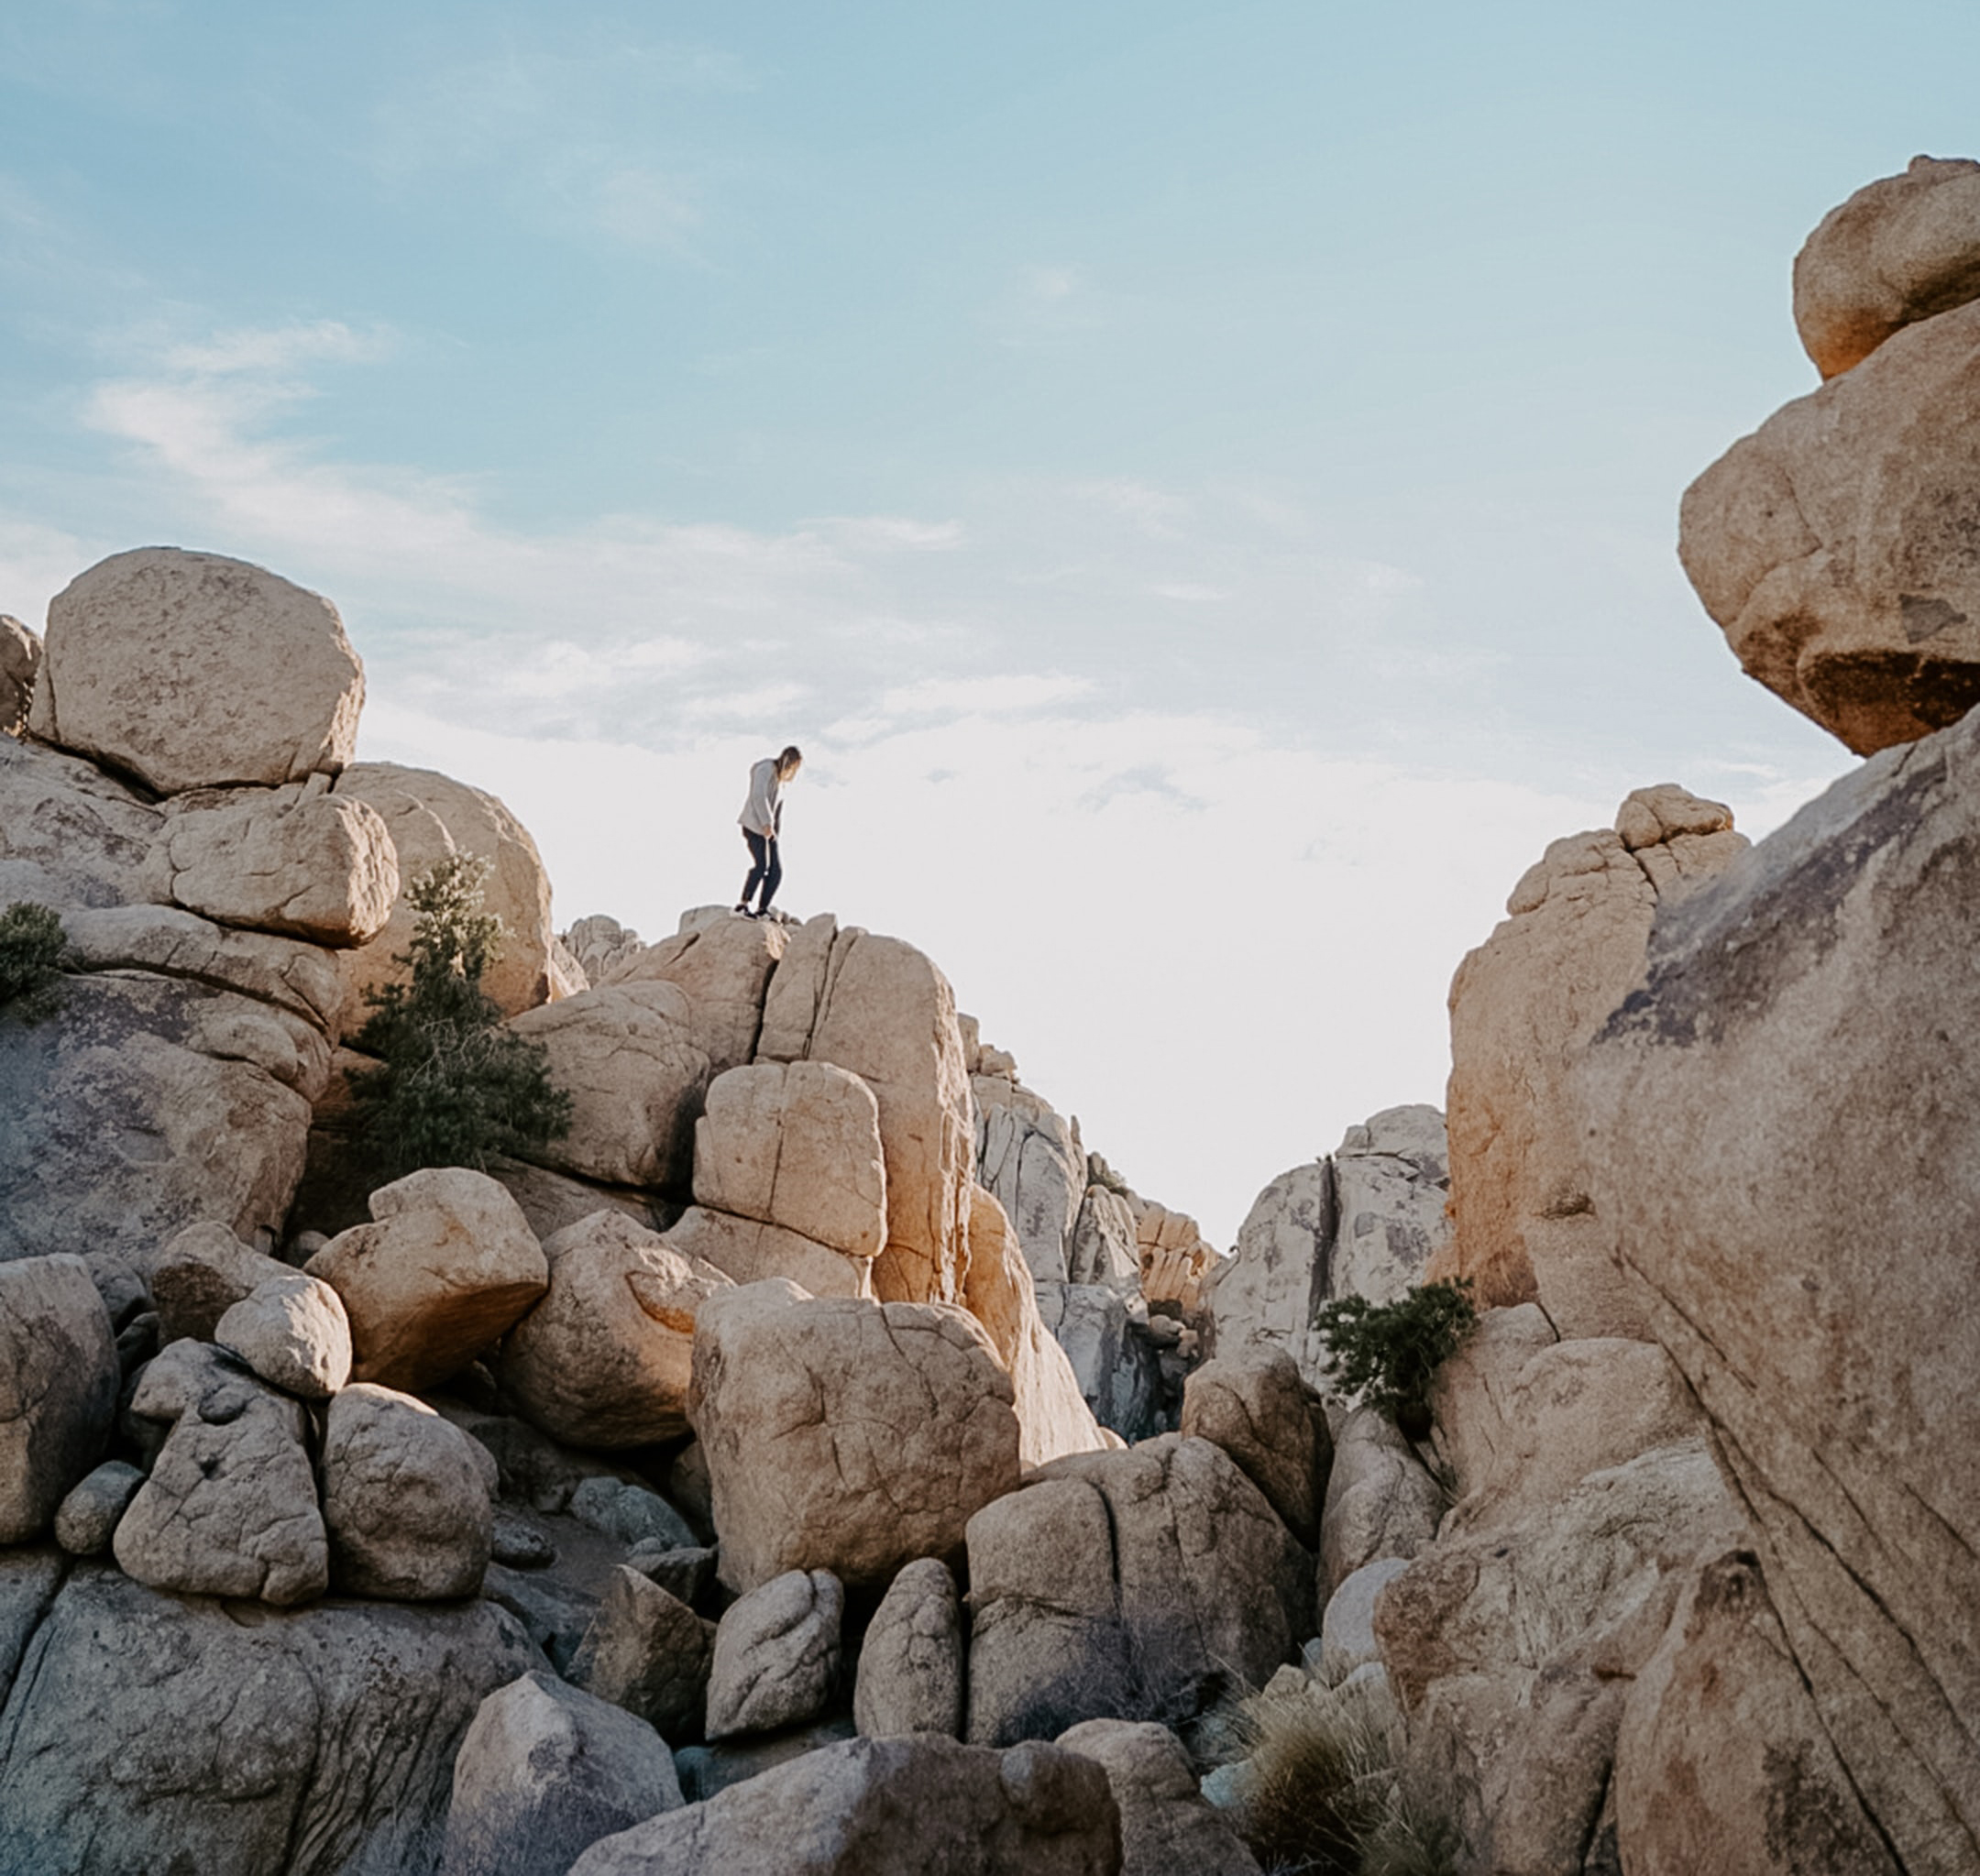 A lone hiker traverses desert boulders.